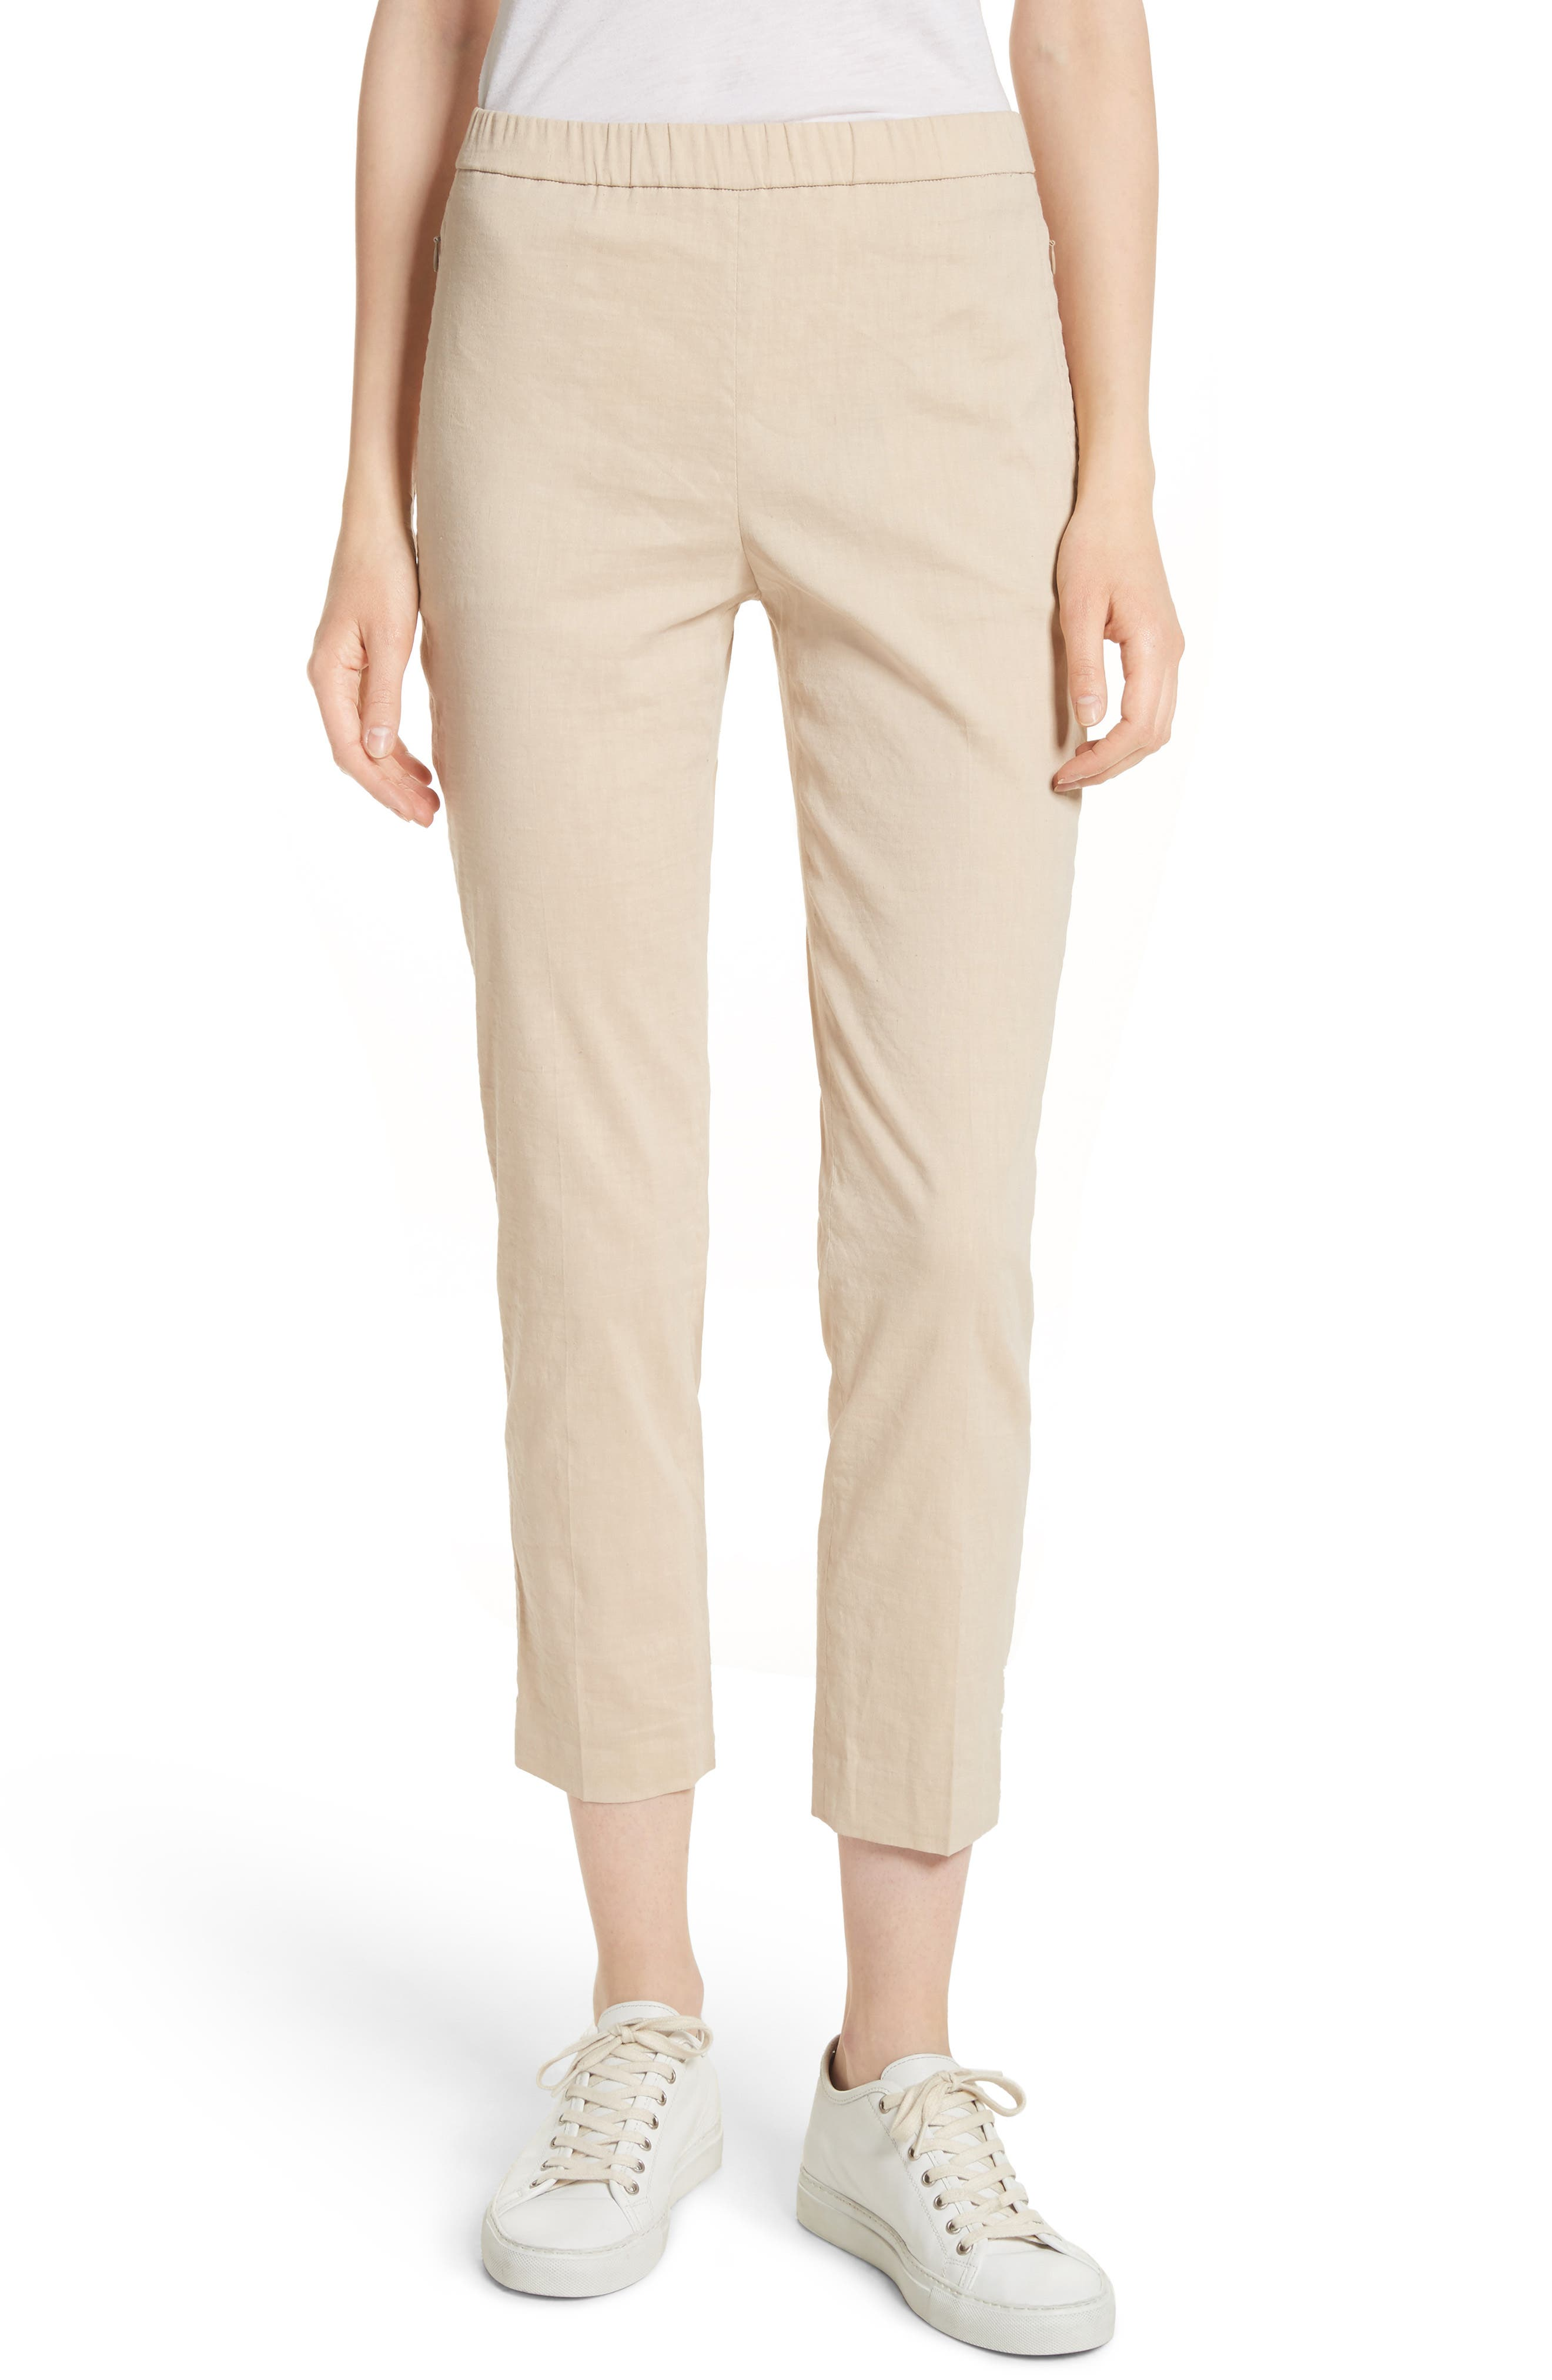 Pull-On Linen Blend Pants,                         Main,                         color, Light Wheat